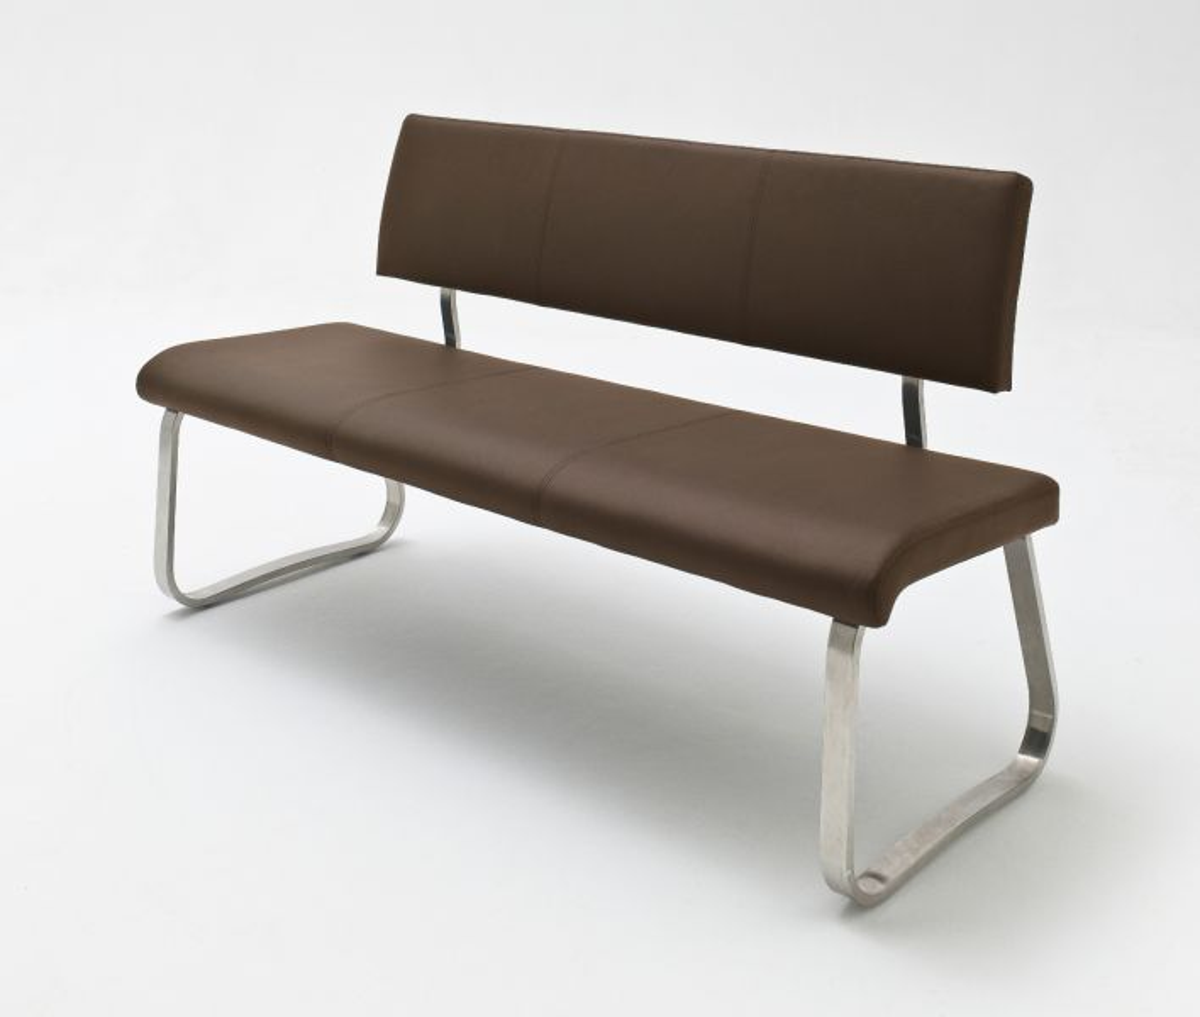 Sitzbank Arco Braun Leder 155 cm